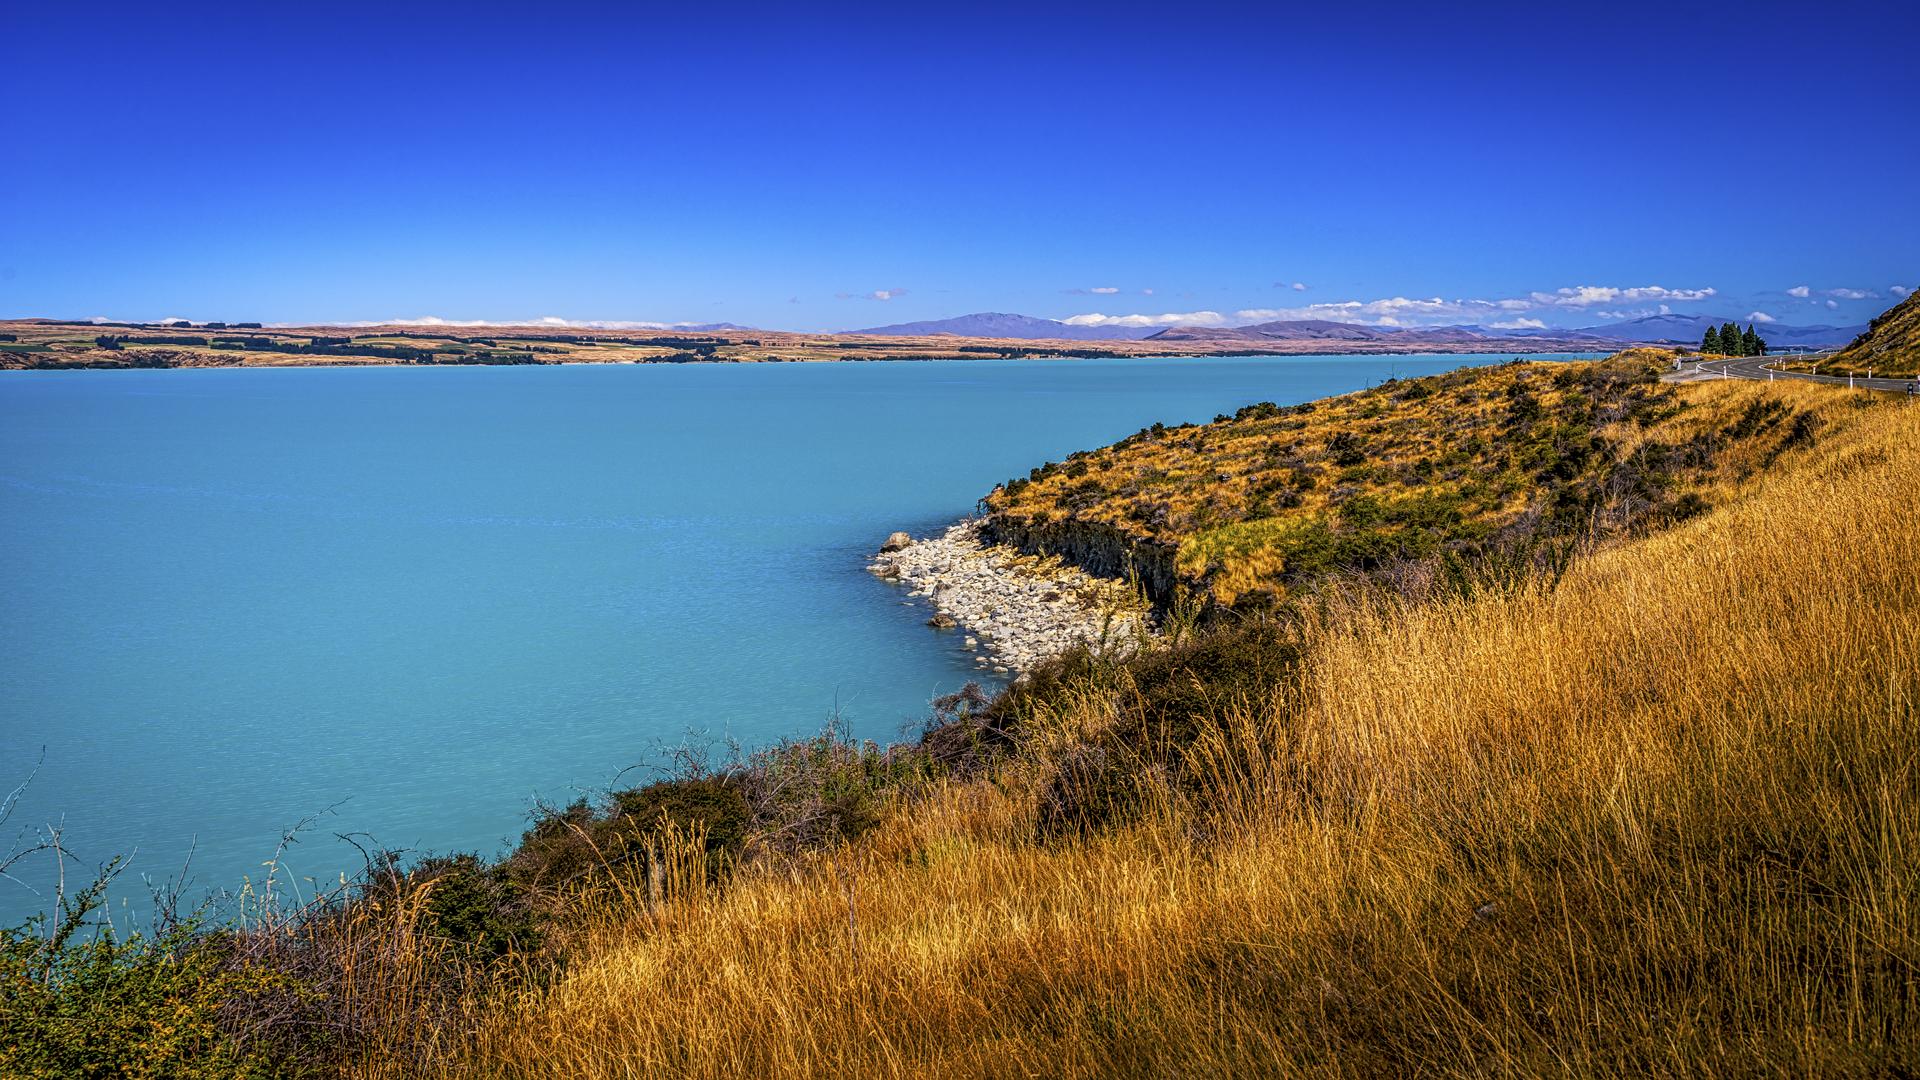 Lake Pukaki1